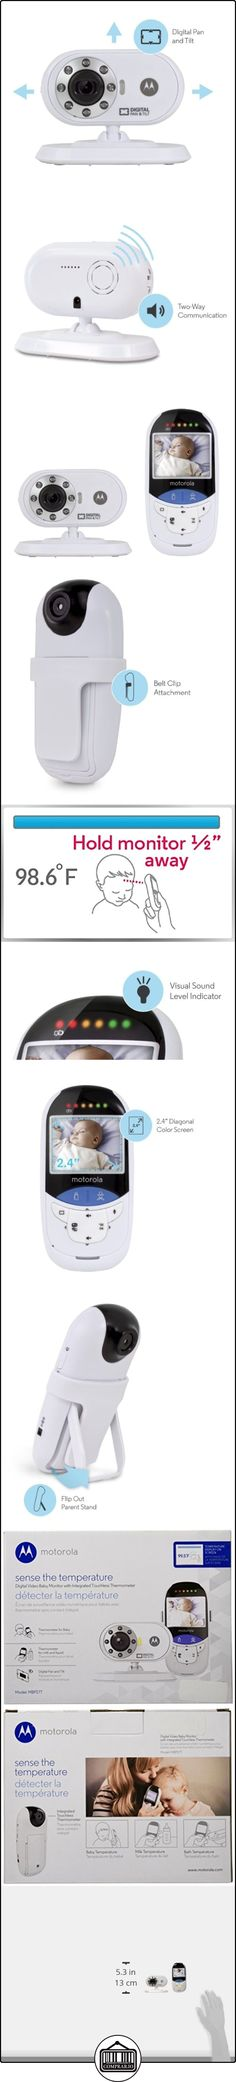 Motorola MBP27T Digital Video Baby Monitor with No-Touch IR Sensor  ✿ Vigilabebés - Seguridad ✿ ▬► Ver oferta: http://comprar.io/goto/B00IM8FXP4